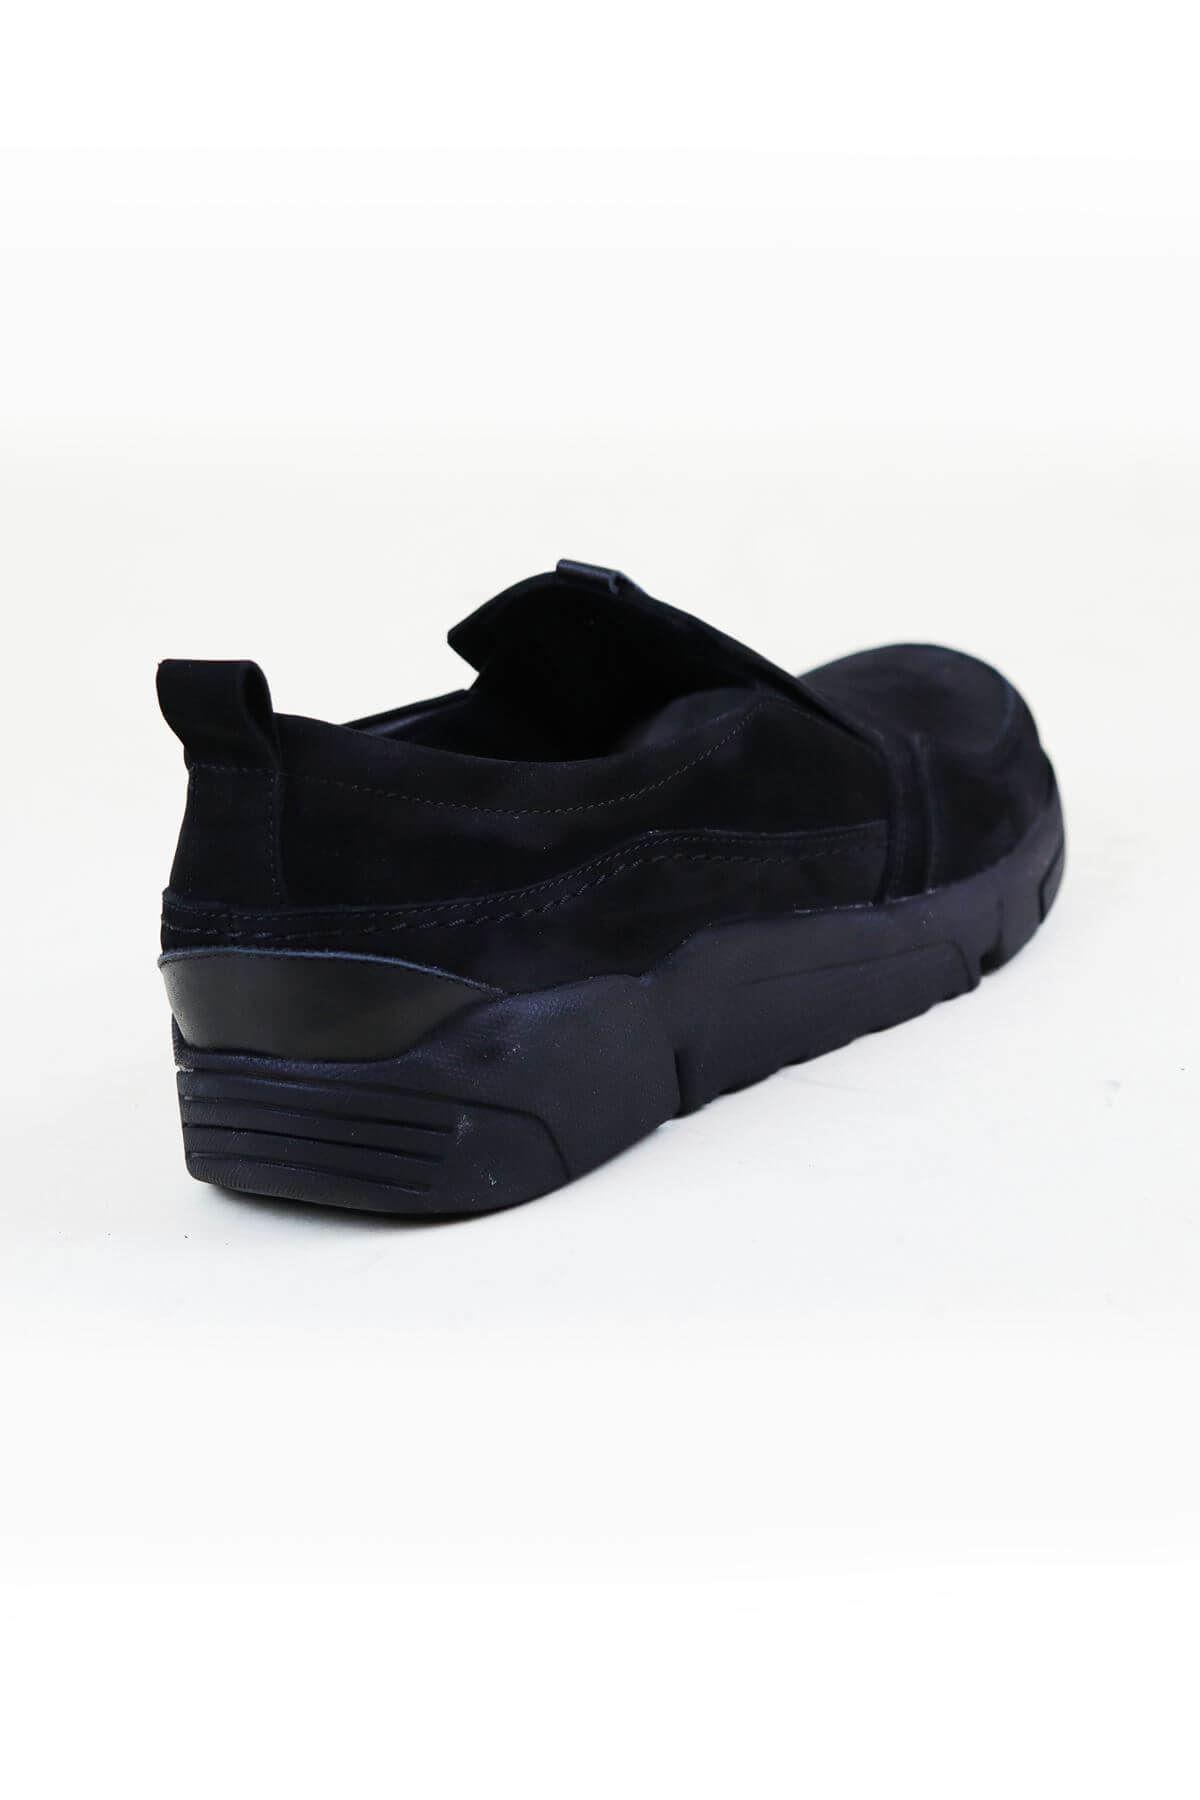 Free Foot 4103 Siyah Hakiki Deri Erkek Ayakkabısı